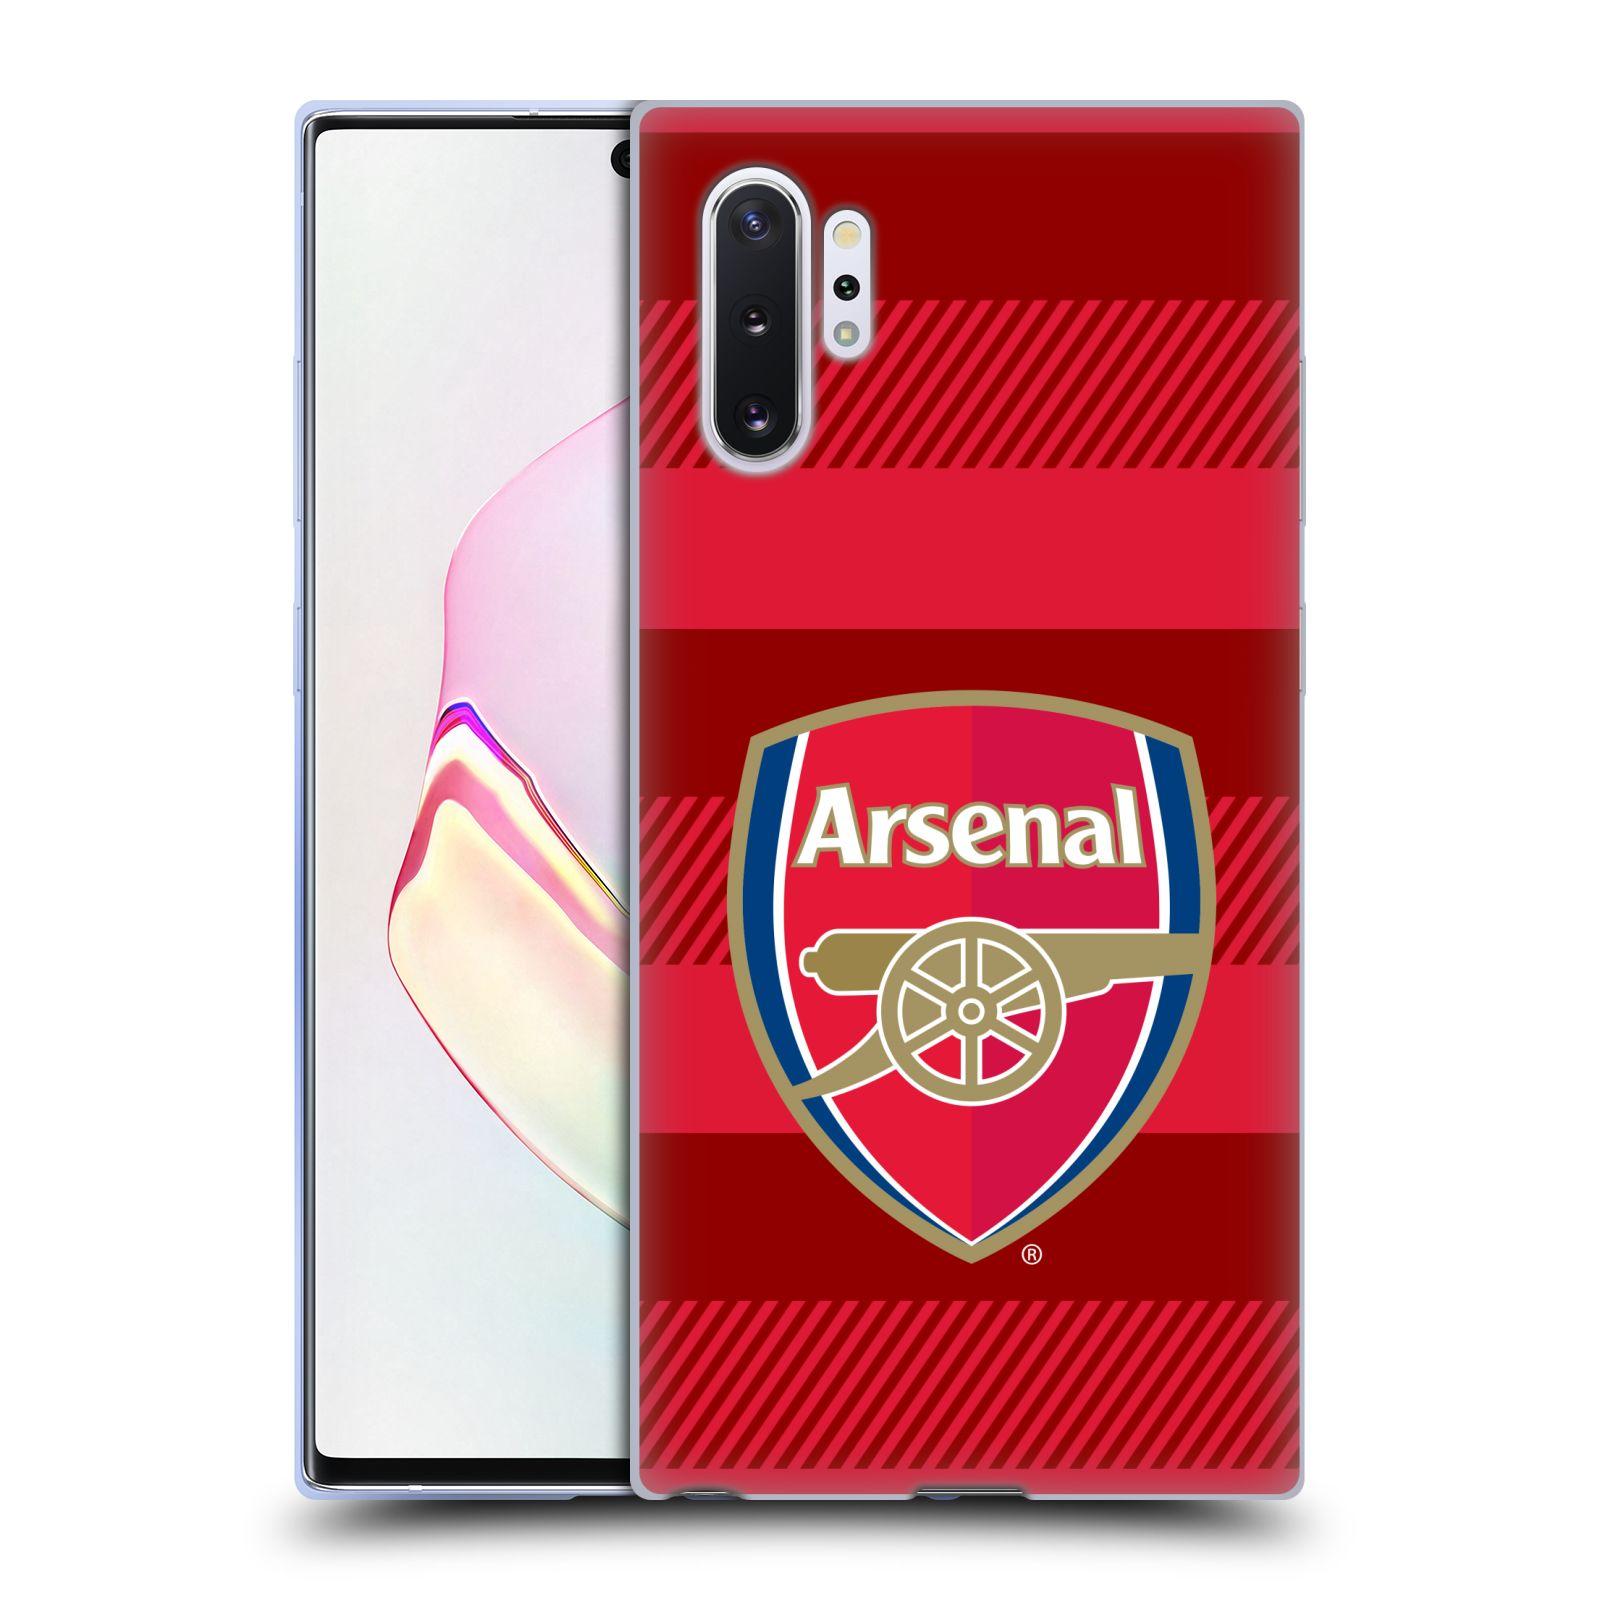 Silikonové pouzdro na mobil Samsung Galaxy Note 10 Plus - Head Case - Arsenal FC - Logo s pruhy